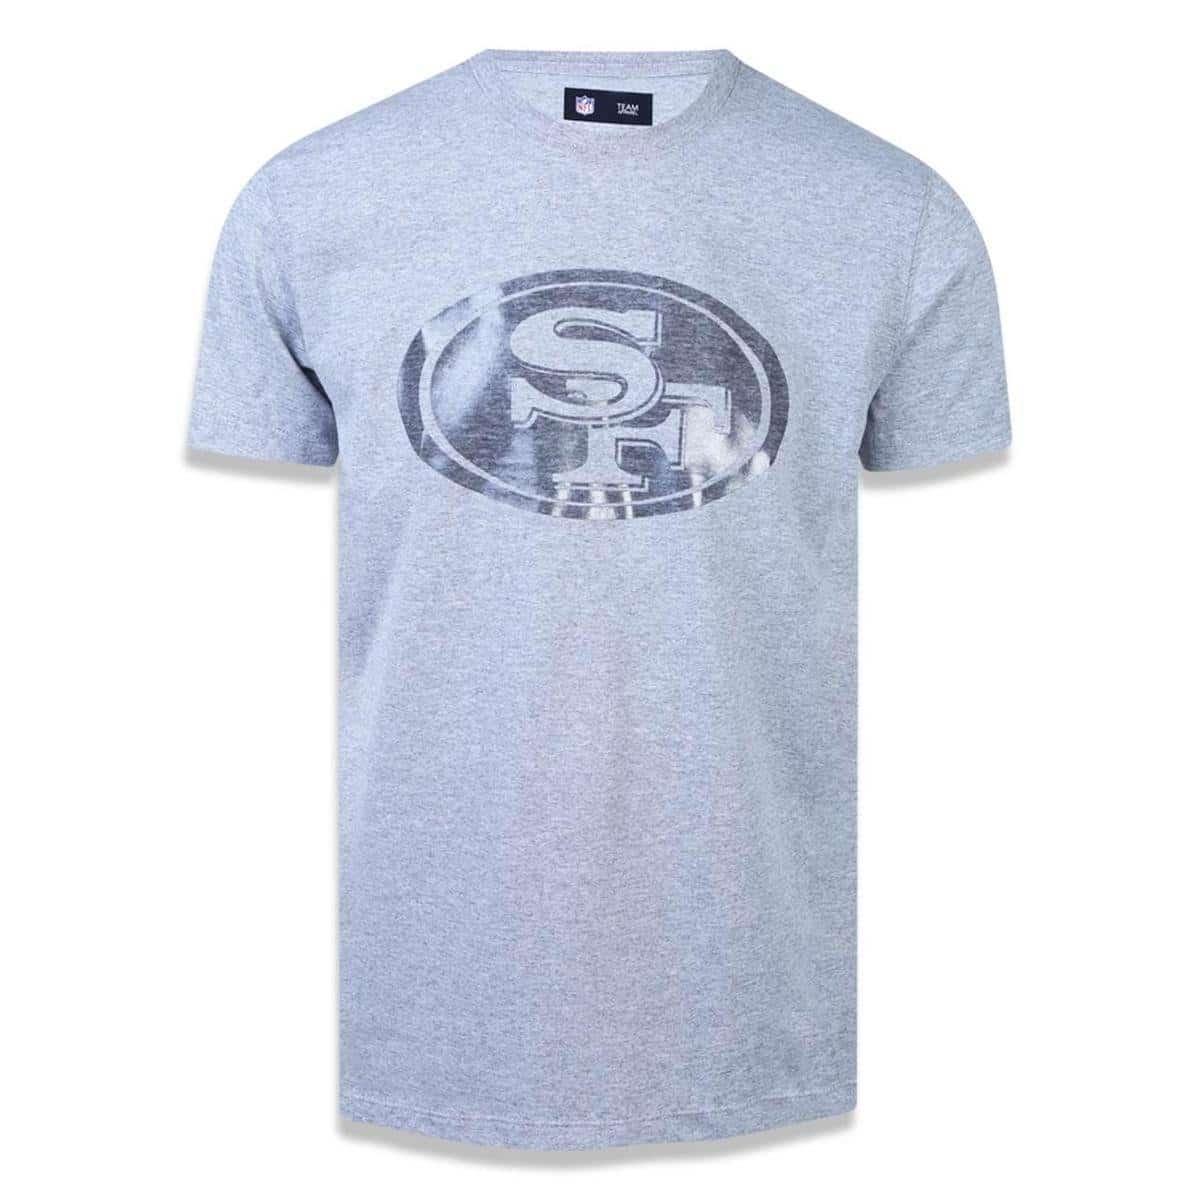 Camiseta do San Francisco 49ers